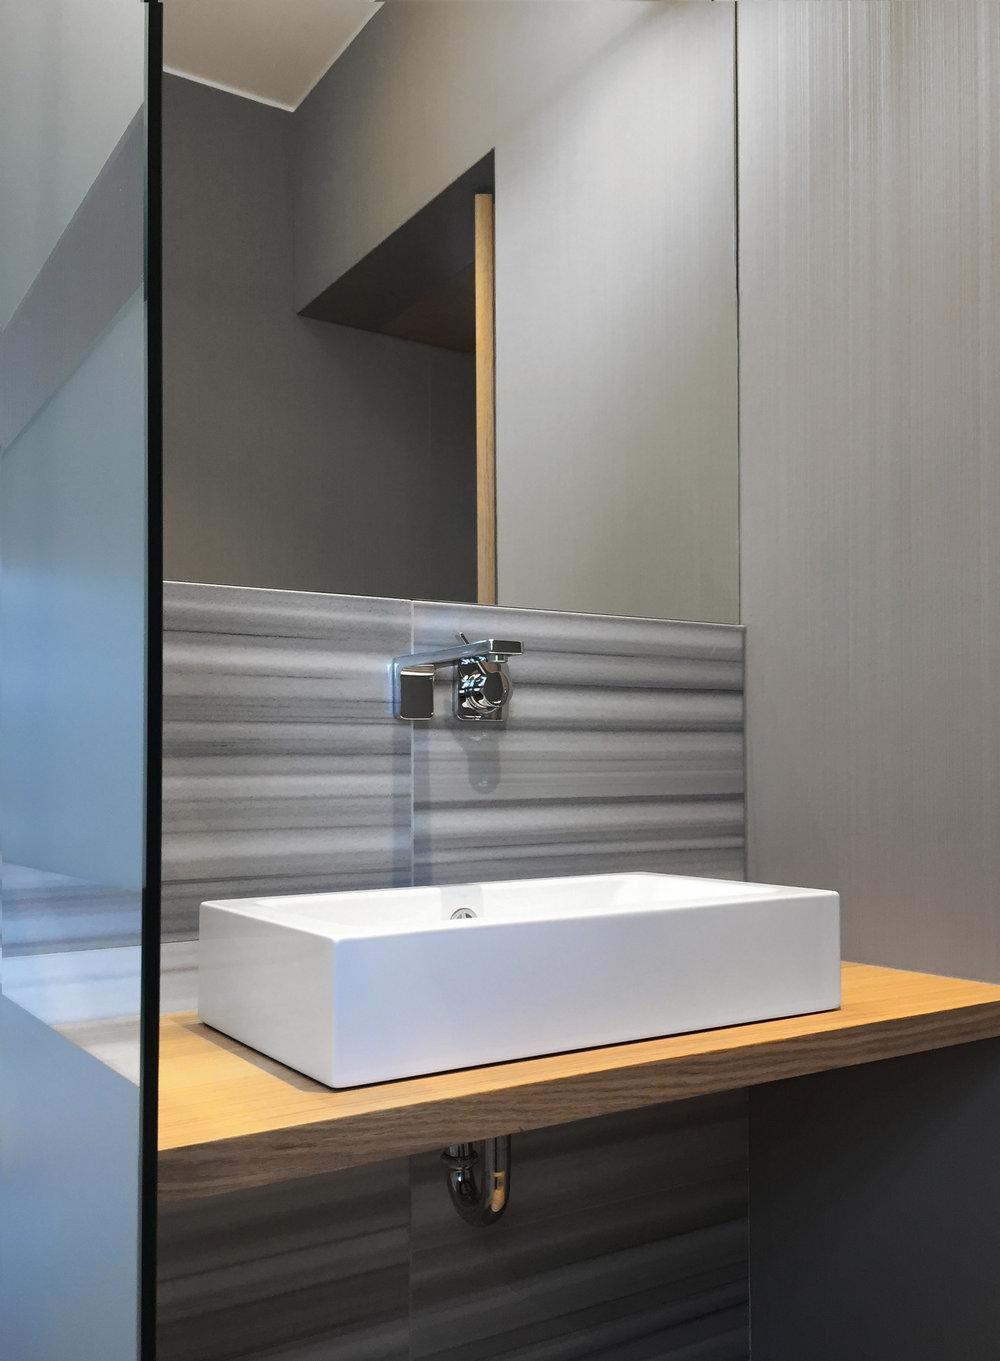 A01 architects - Residence Krumpendorf_(c) Hannes Kohlmeier__web05